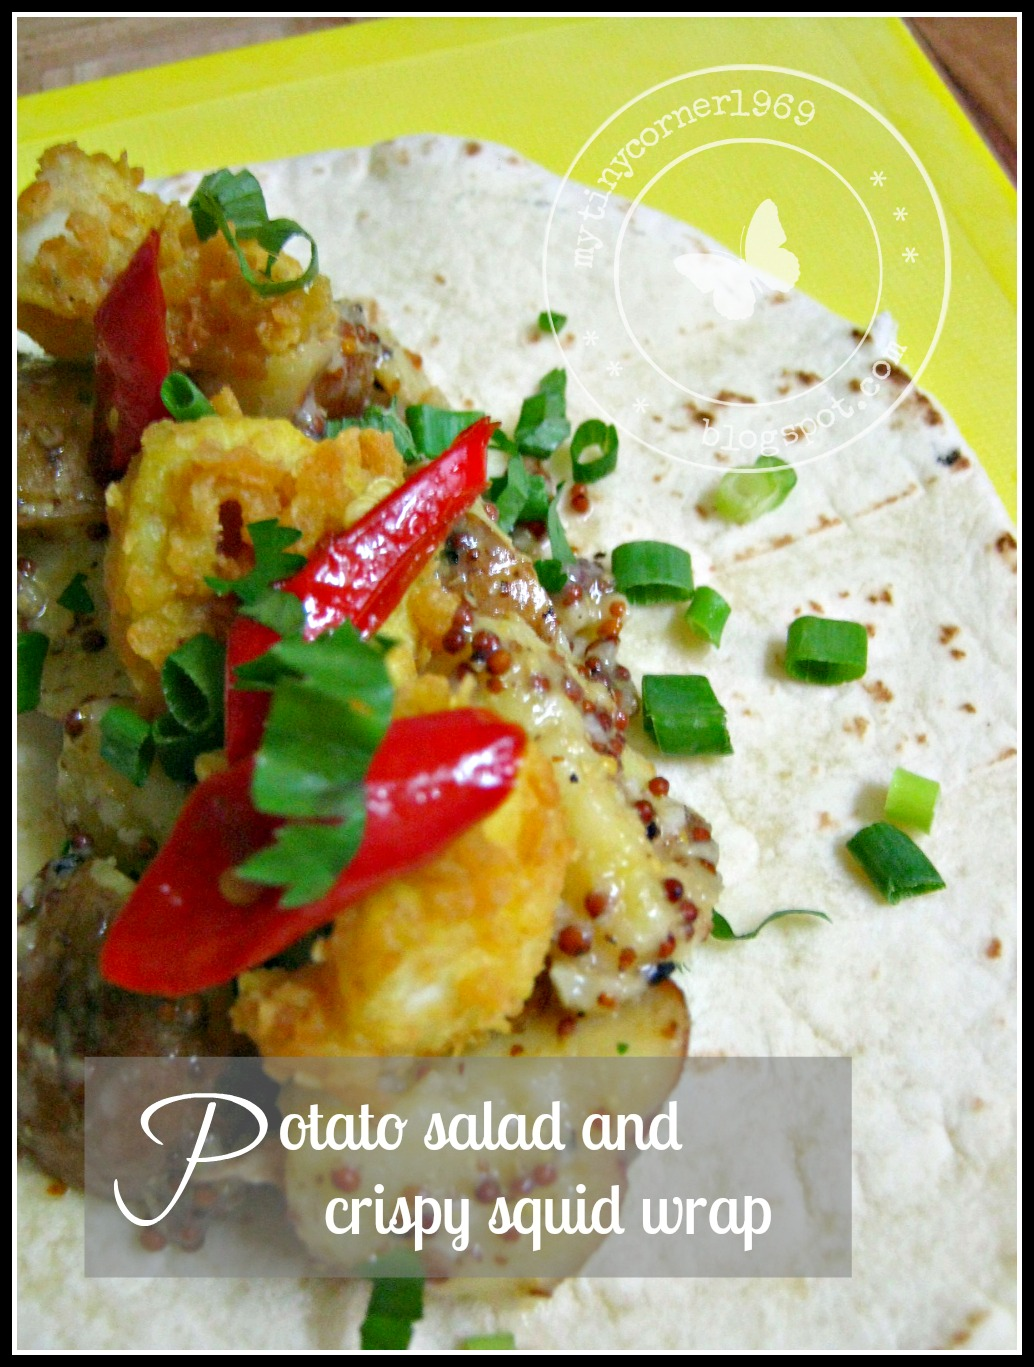 Potato Salad and Crispy Squid Wrap